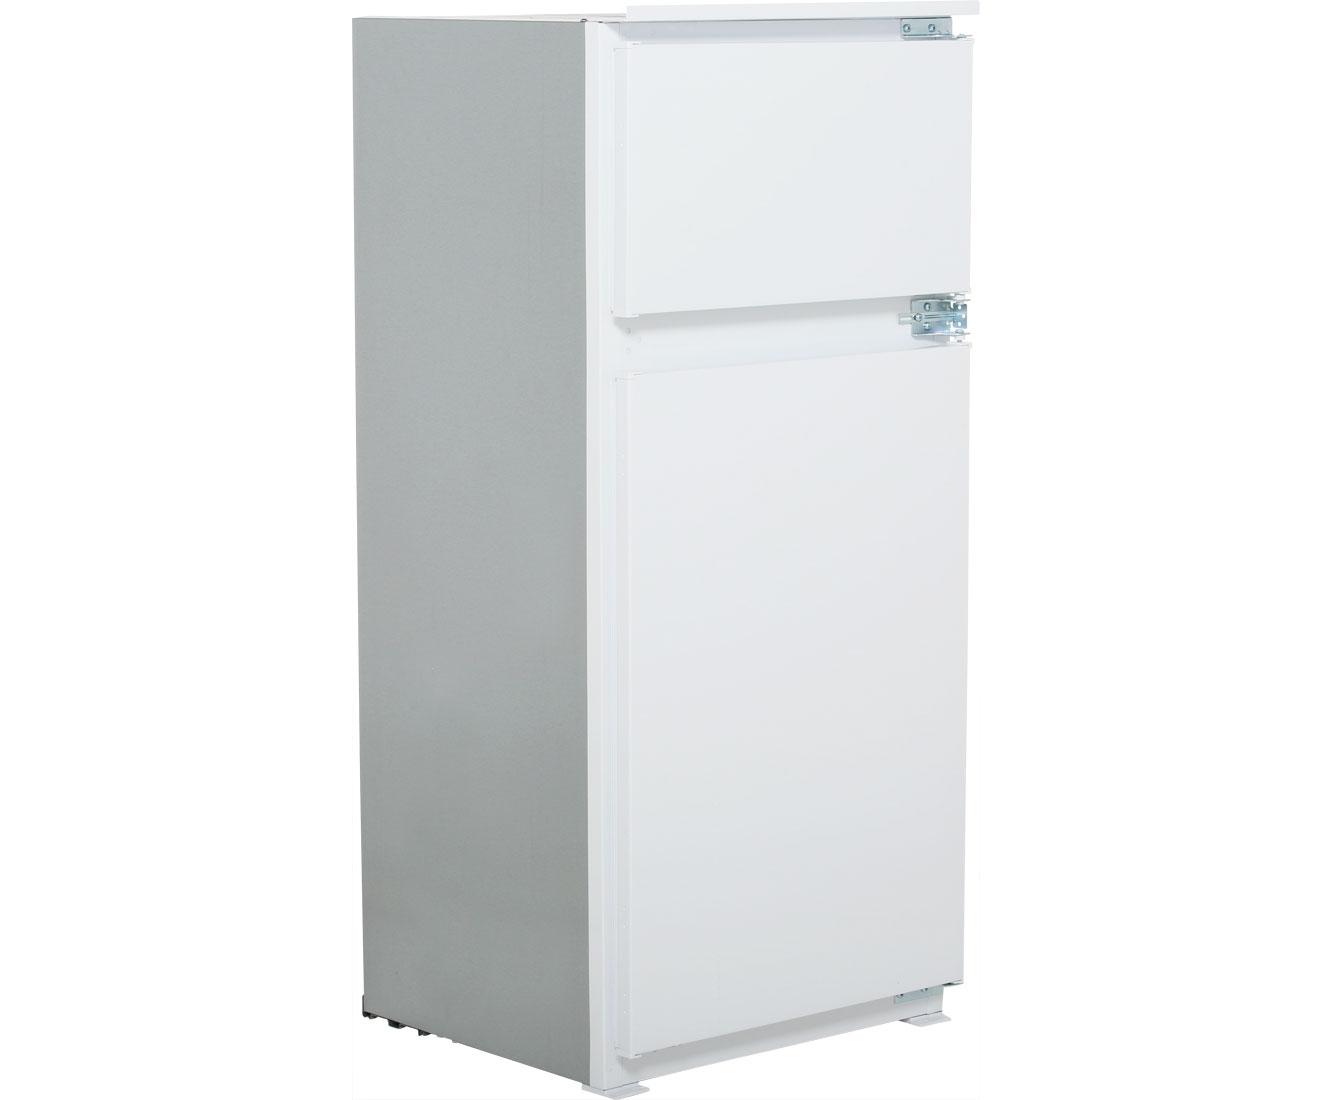 Kühlschrank Kombi : Kühl kombi bosch kgn ai a nofrost kühl gefrier kombination